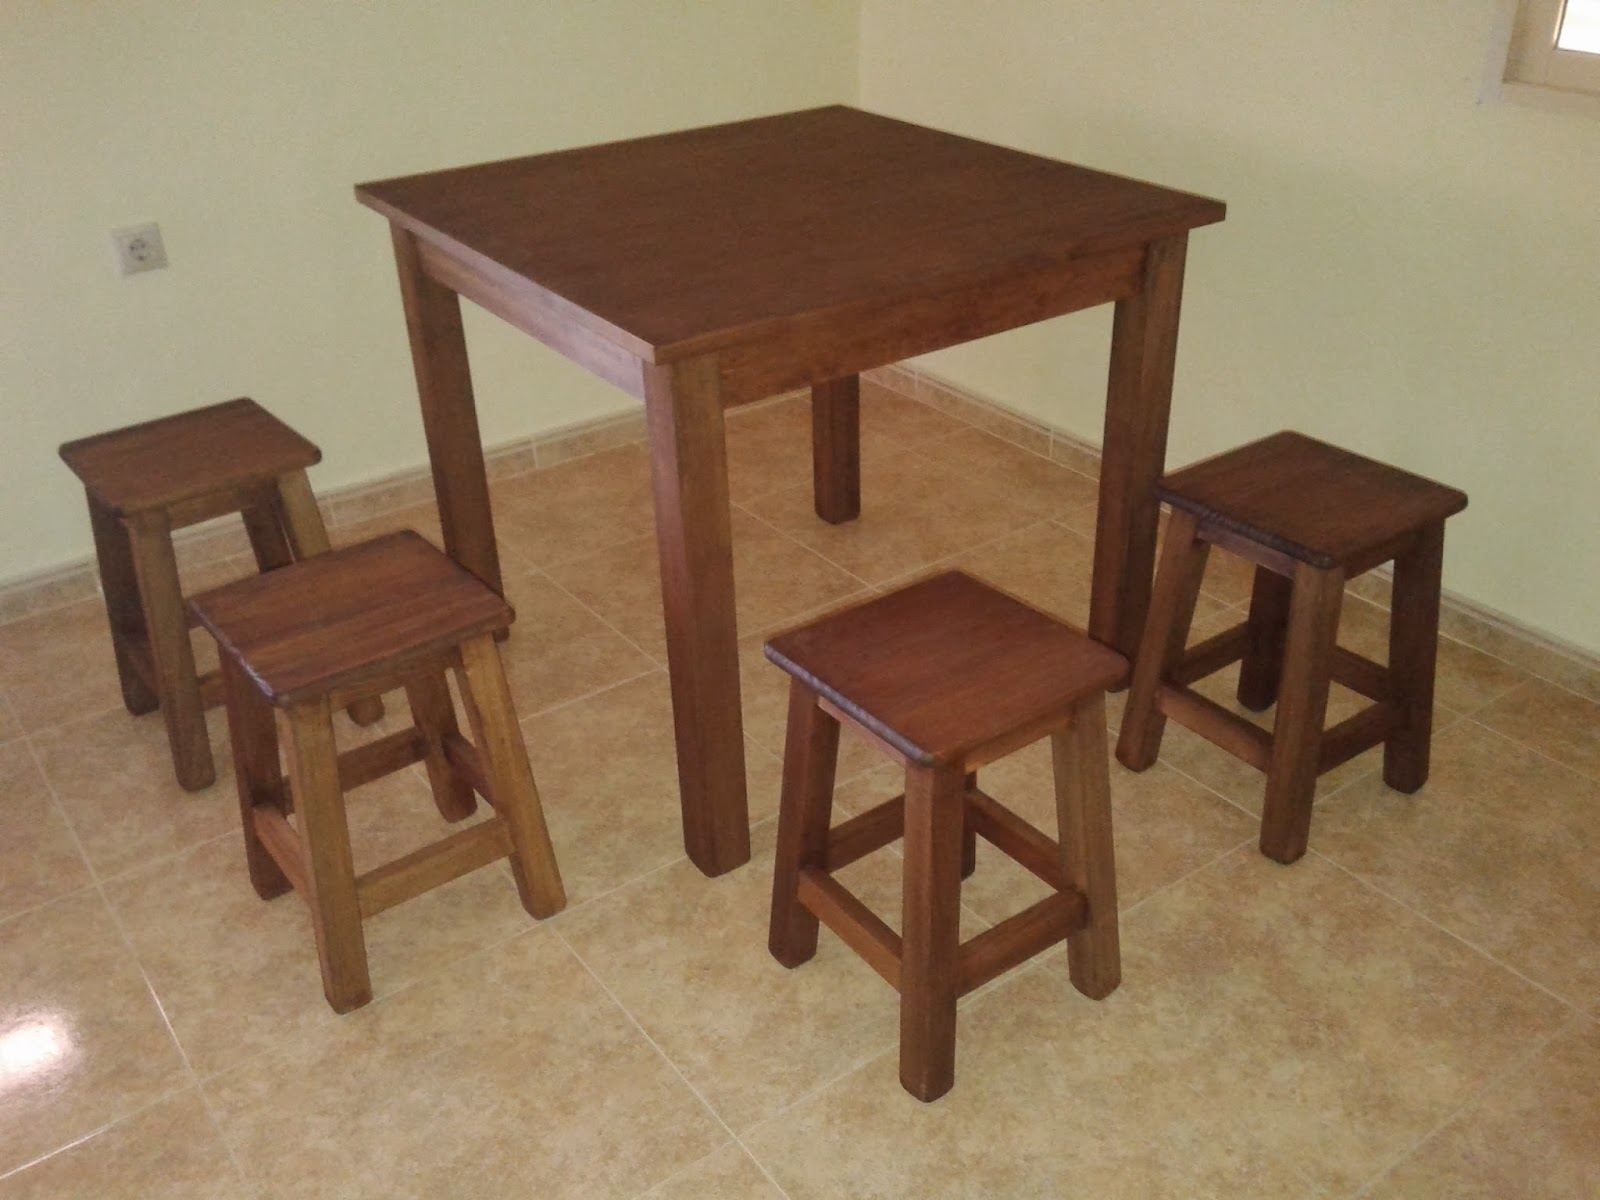 Mesa redonda o taburetes comedor mesa redonda alta o - Mesa alta con taburetes ...